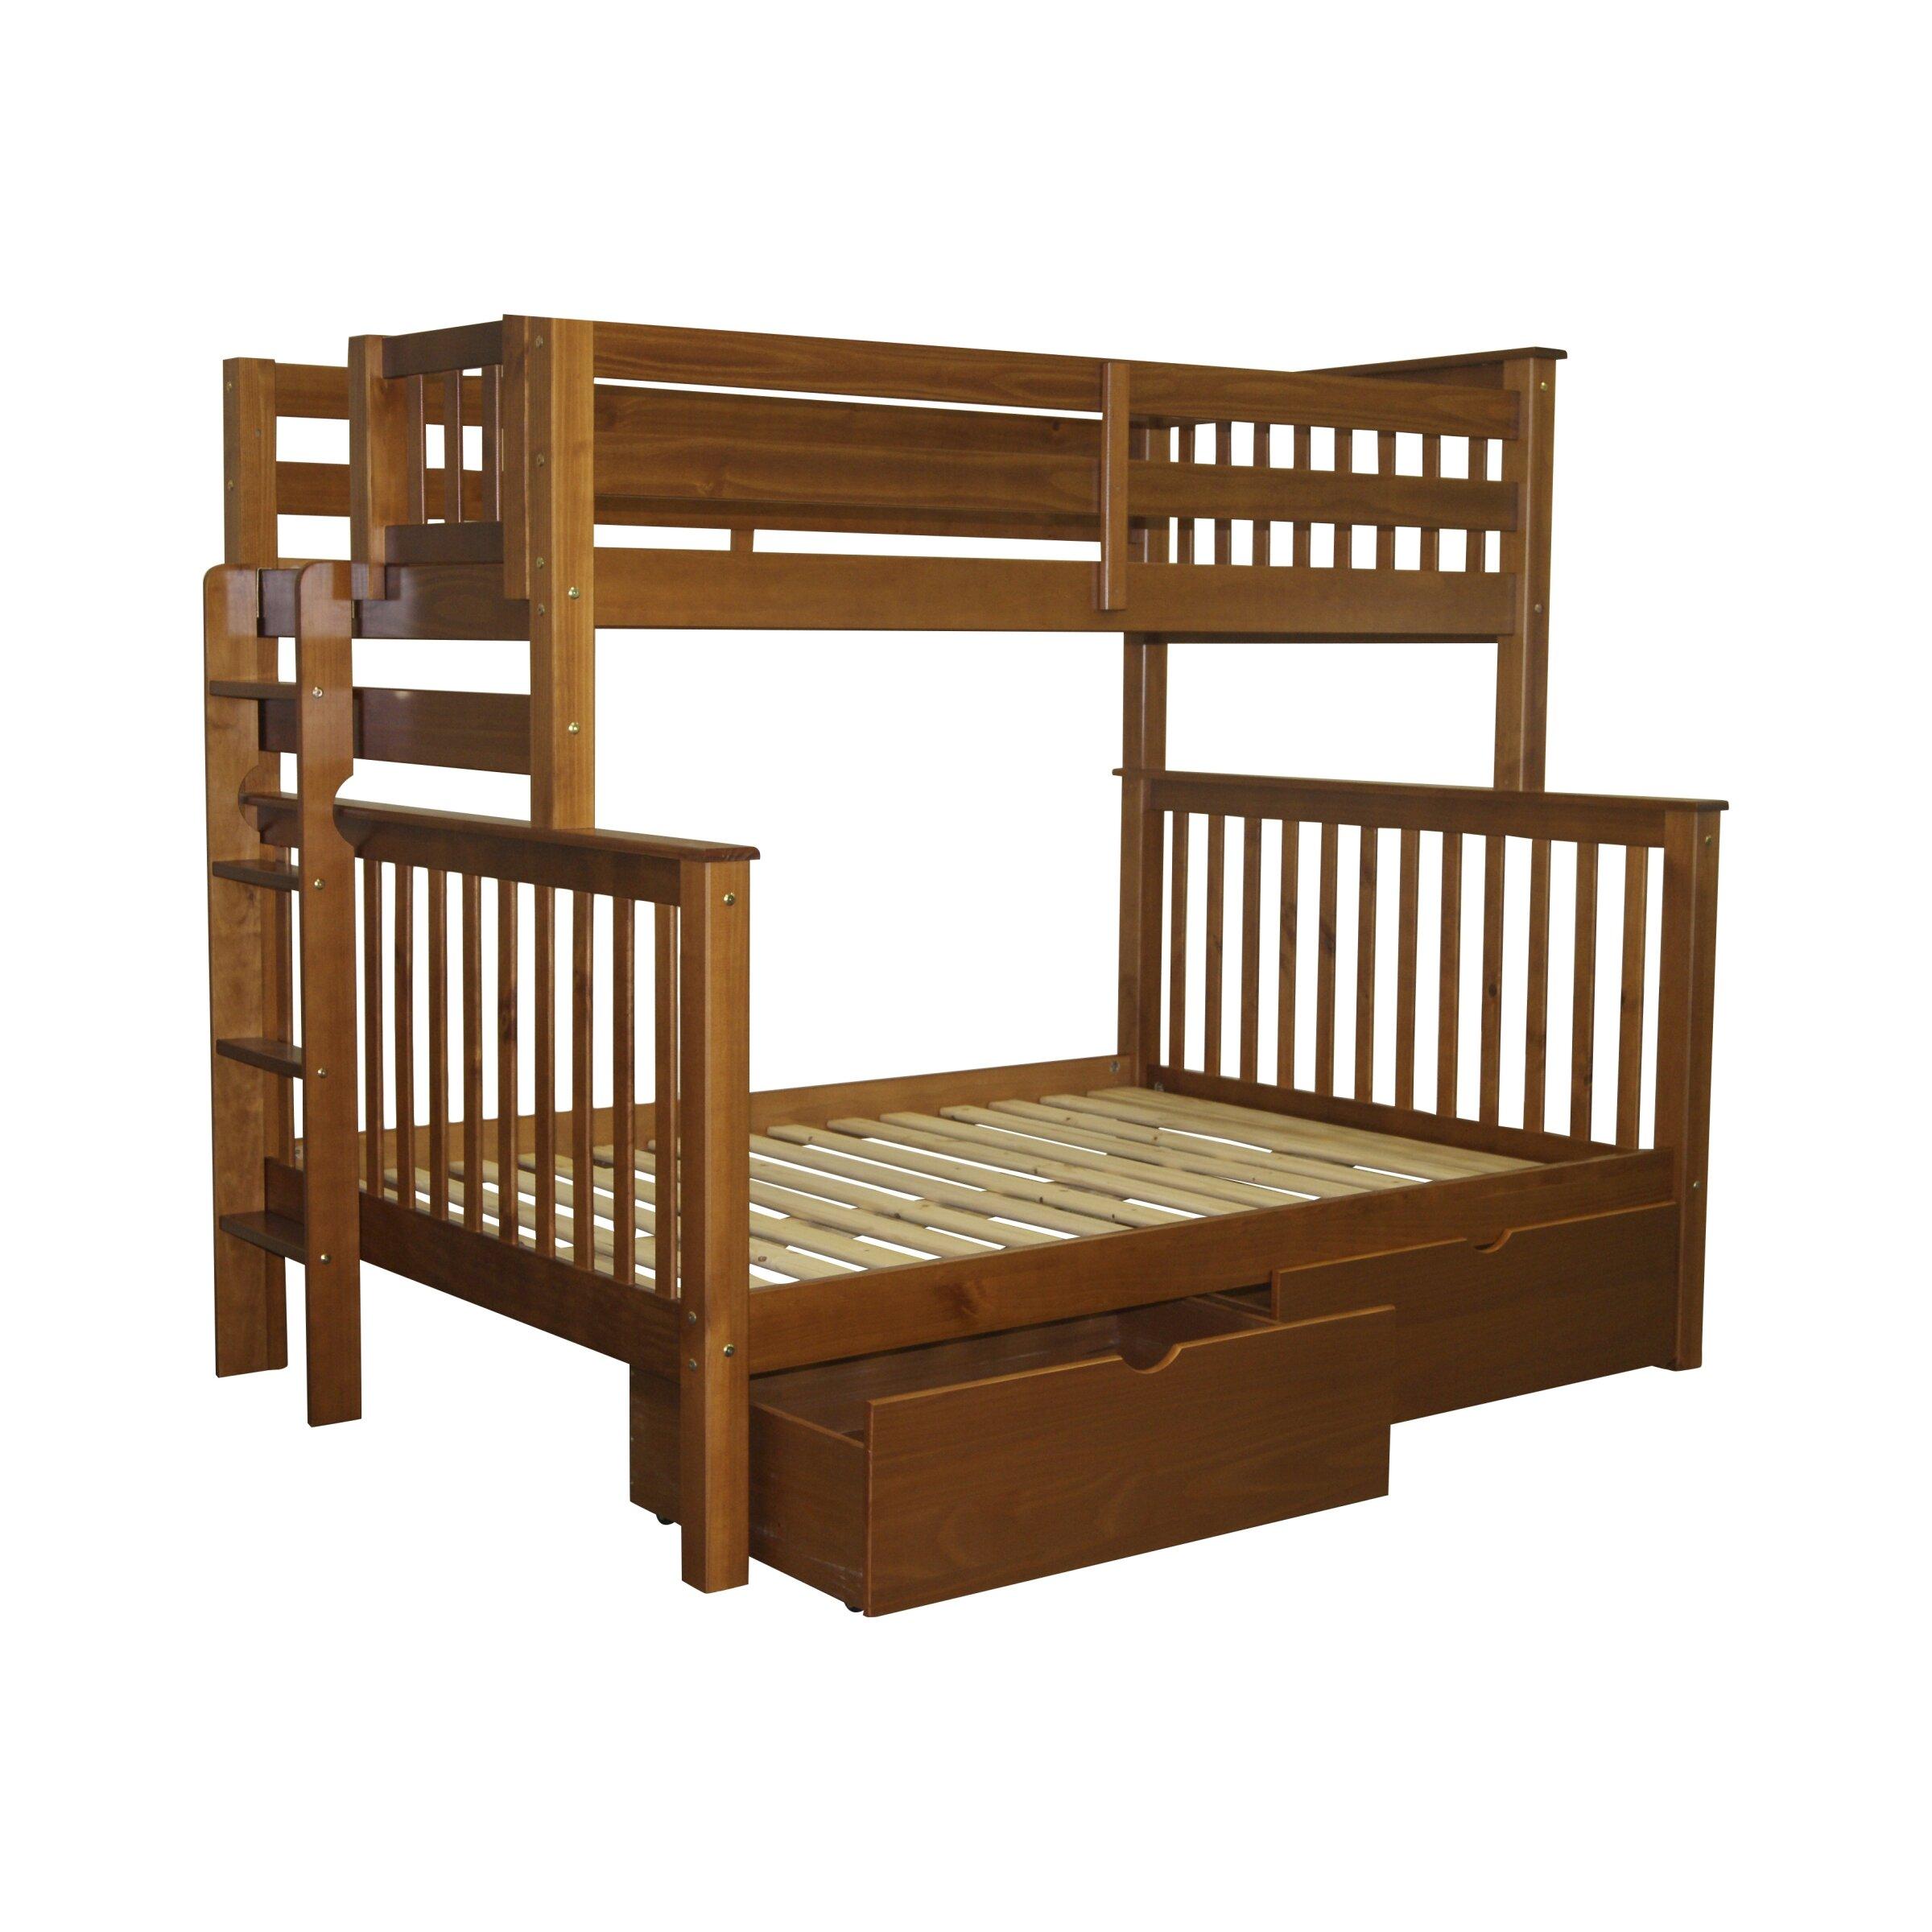 bedz king mission twin over full bunk bed reviews wayfair. Black Bedroom Furniture Sets. Home Design Ideas